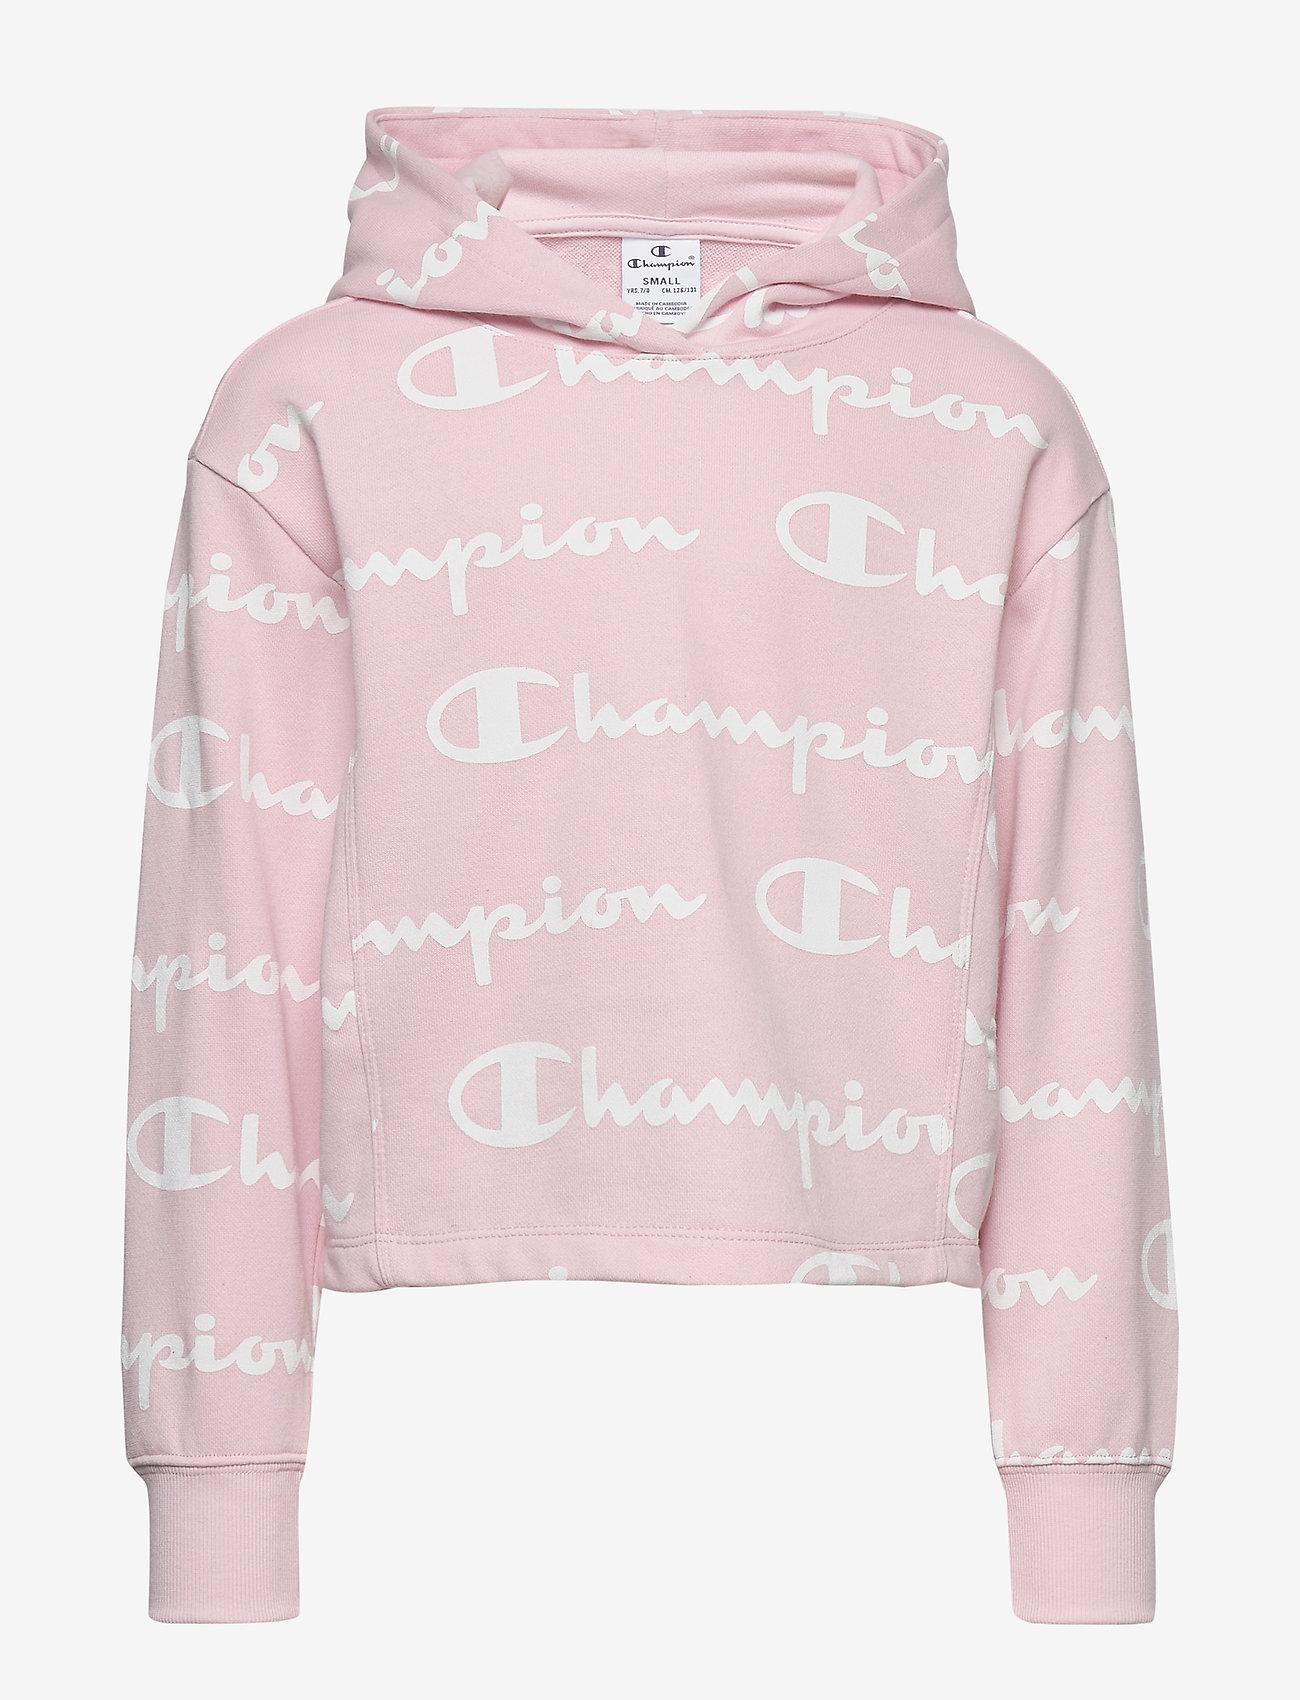 light pink champion hoodie